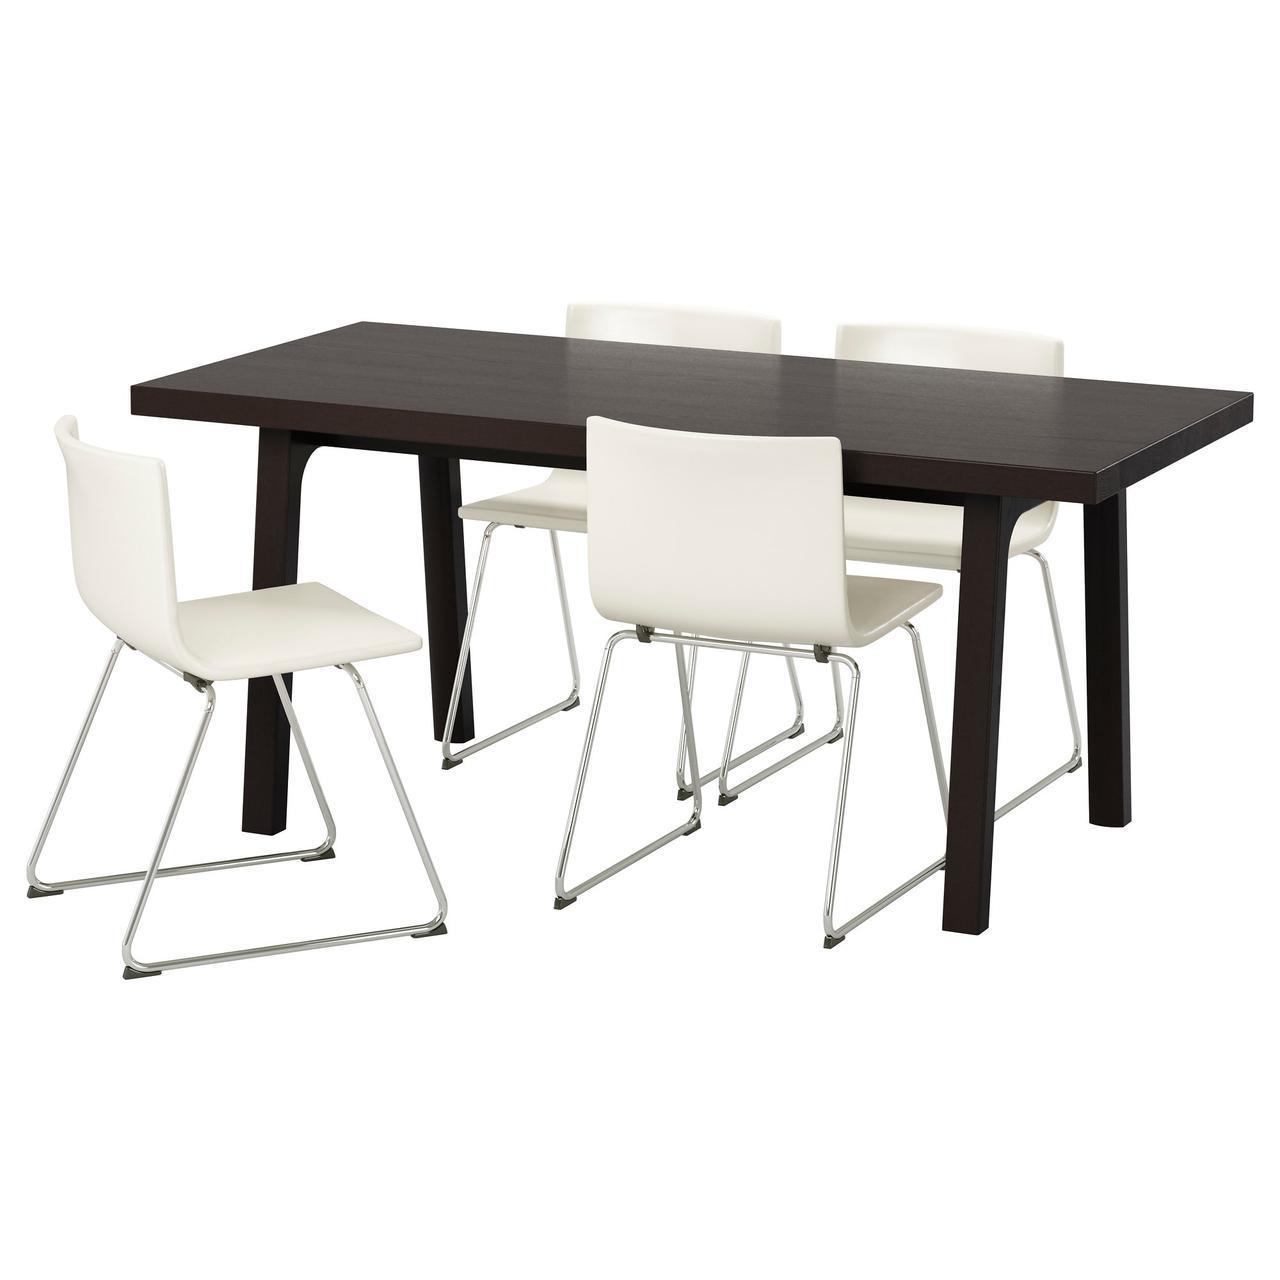 IKEA VASTANBY/VASTANA / BERNHARD (191.031.83) Стол и 4 стула, темно-коричневый